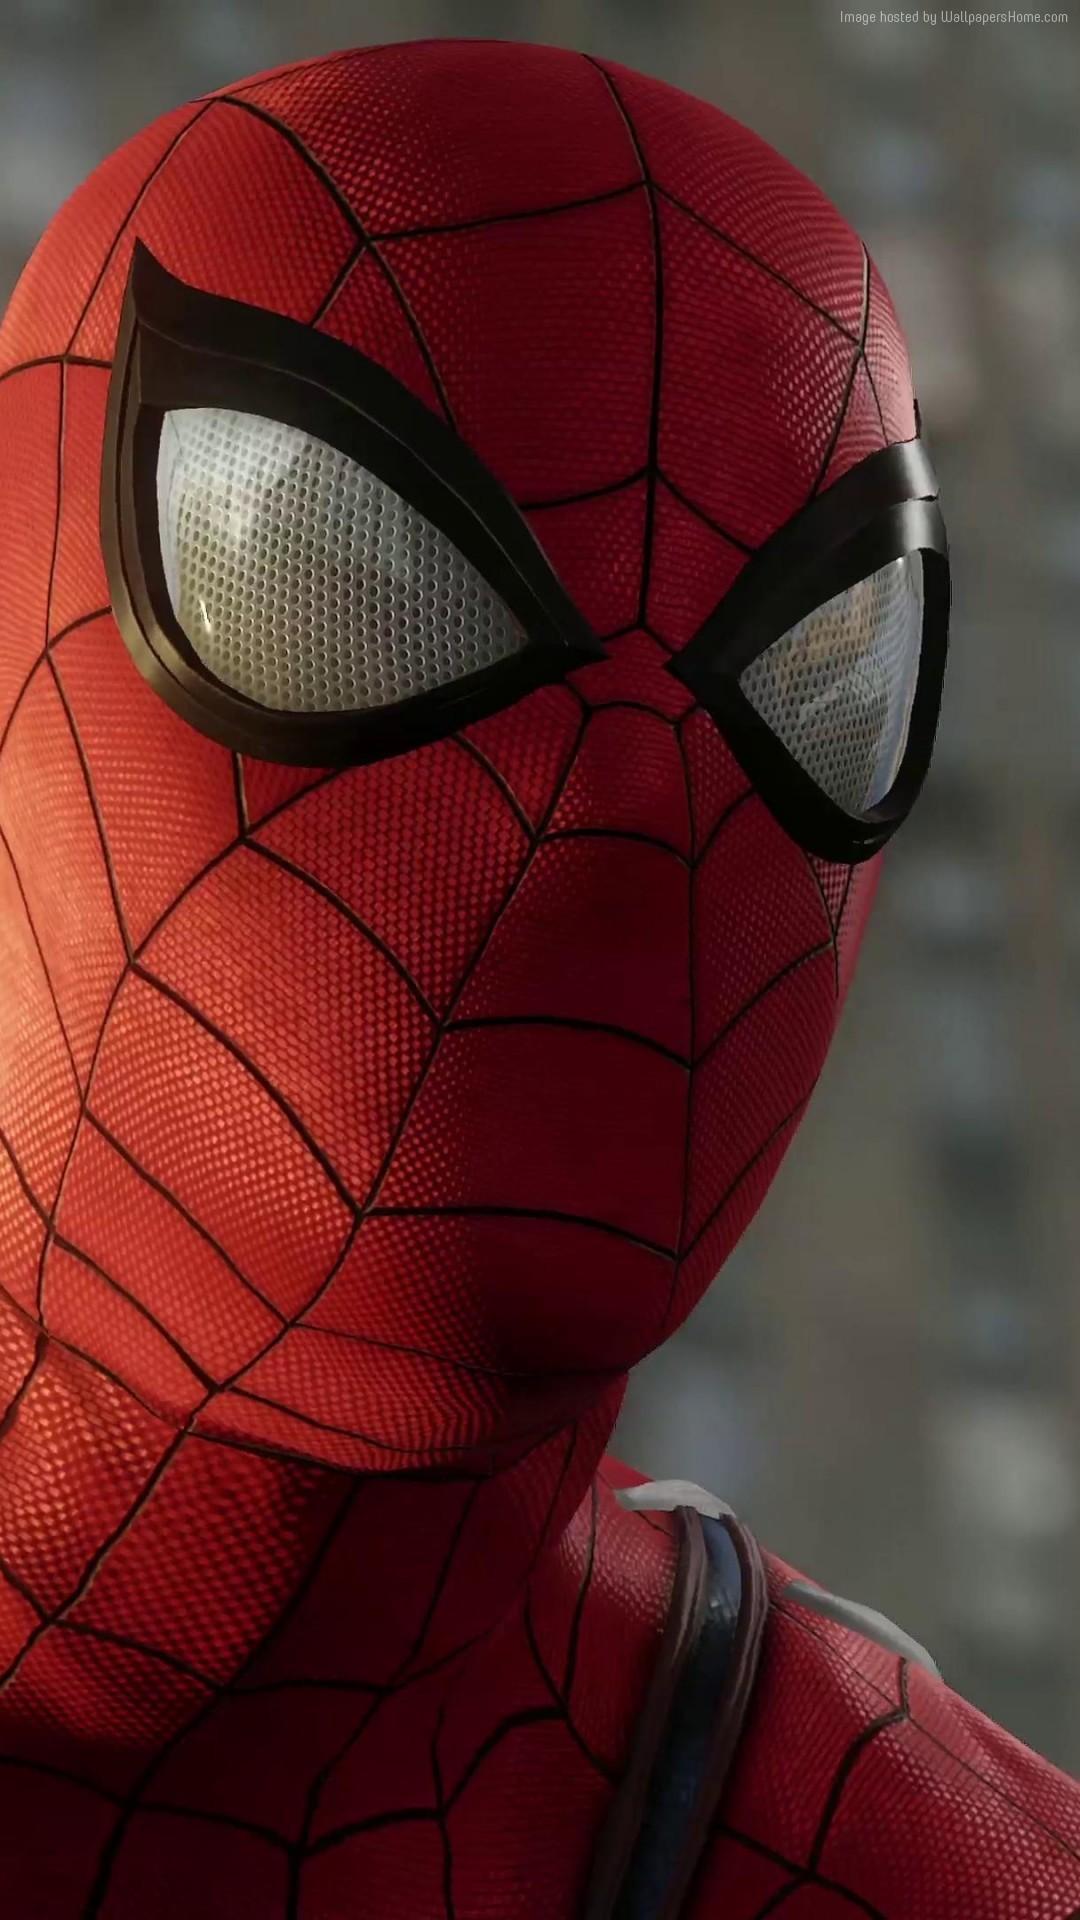 chelovek pauk wallpaper spider man marvel superhero ps4 iphone 7 wallpapers